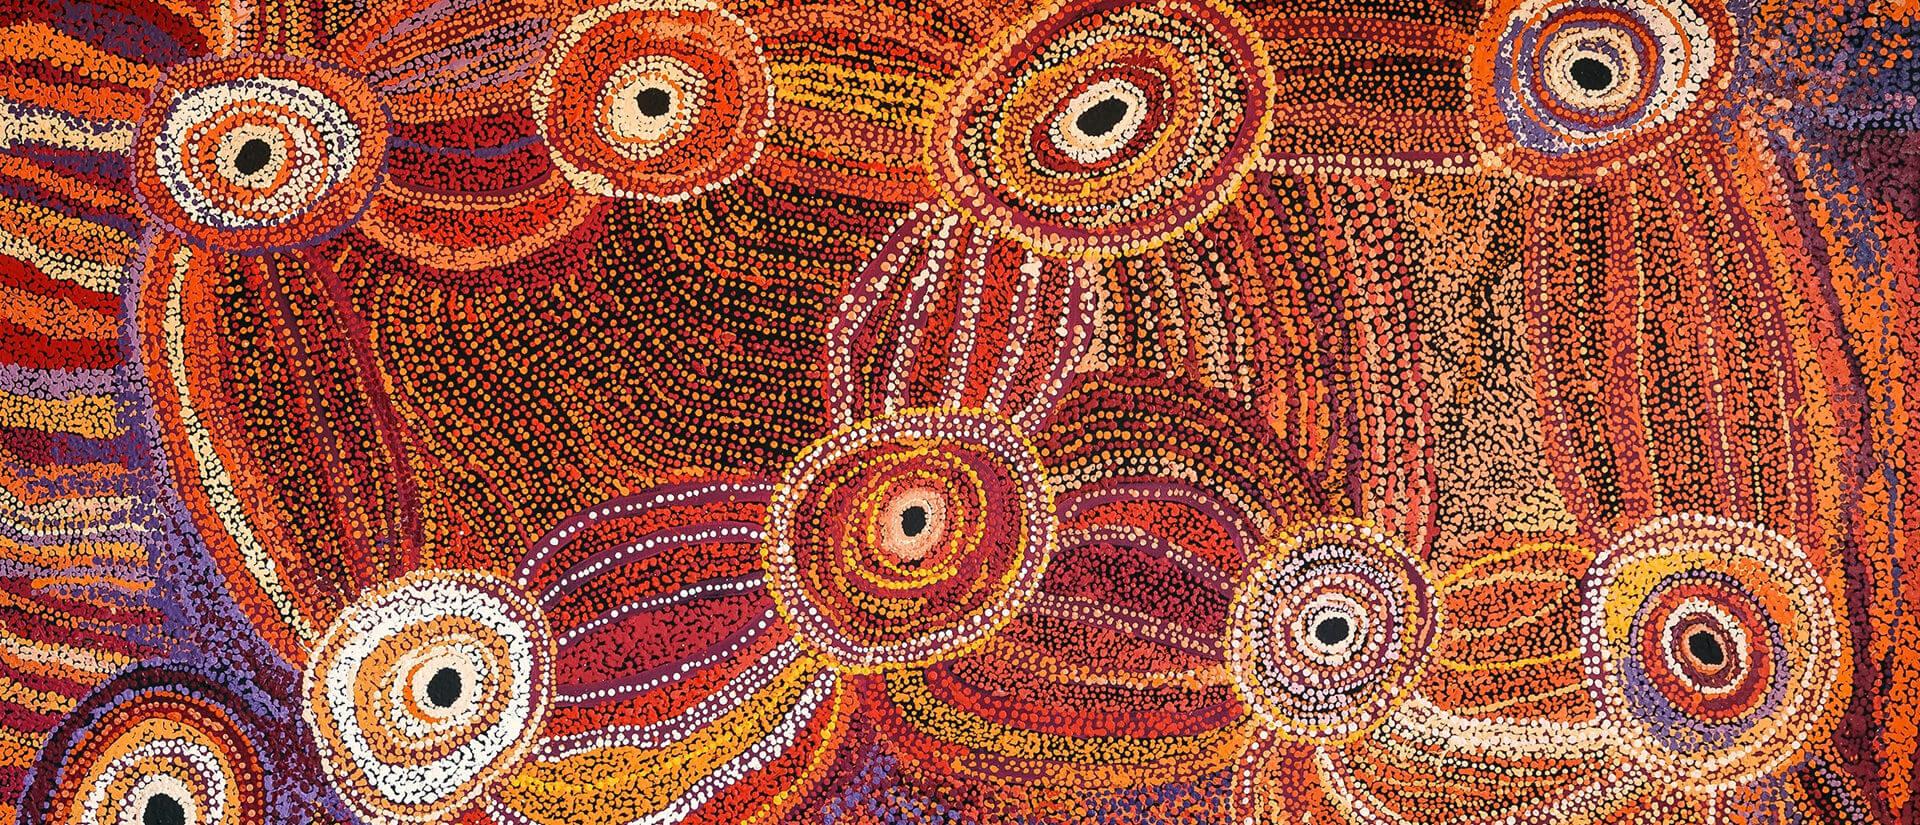 Northern Territory Destination